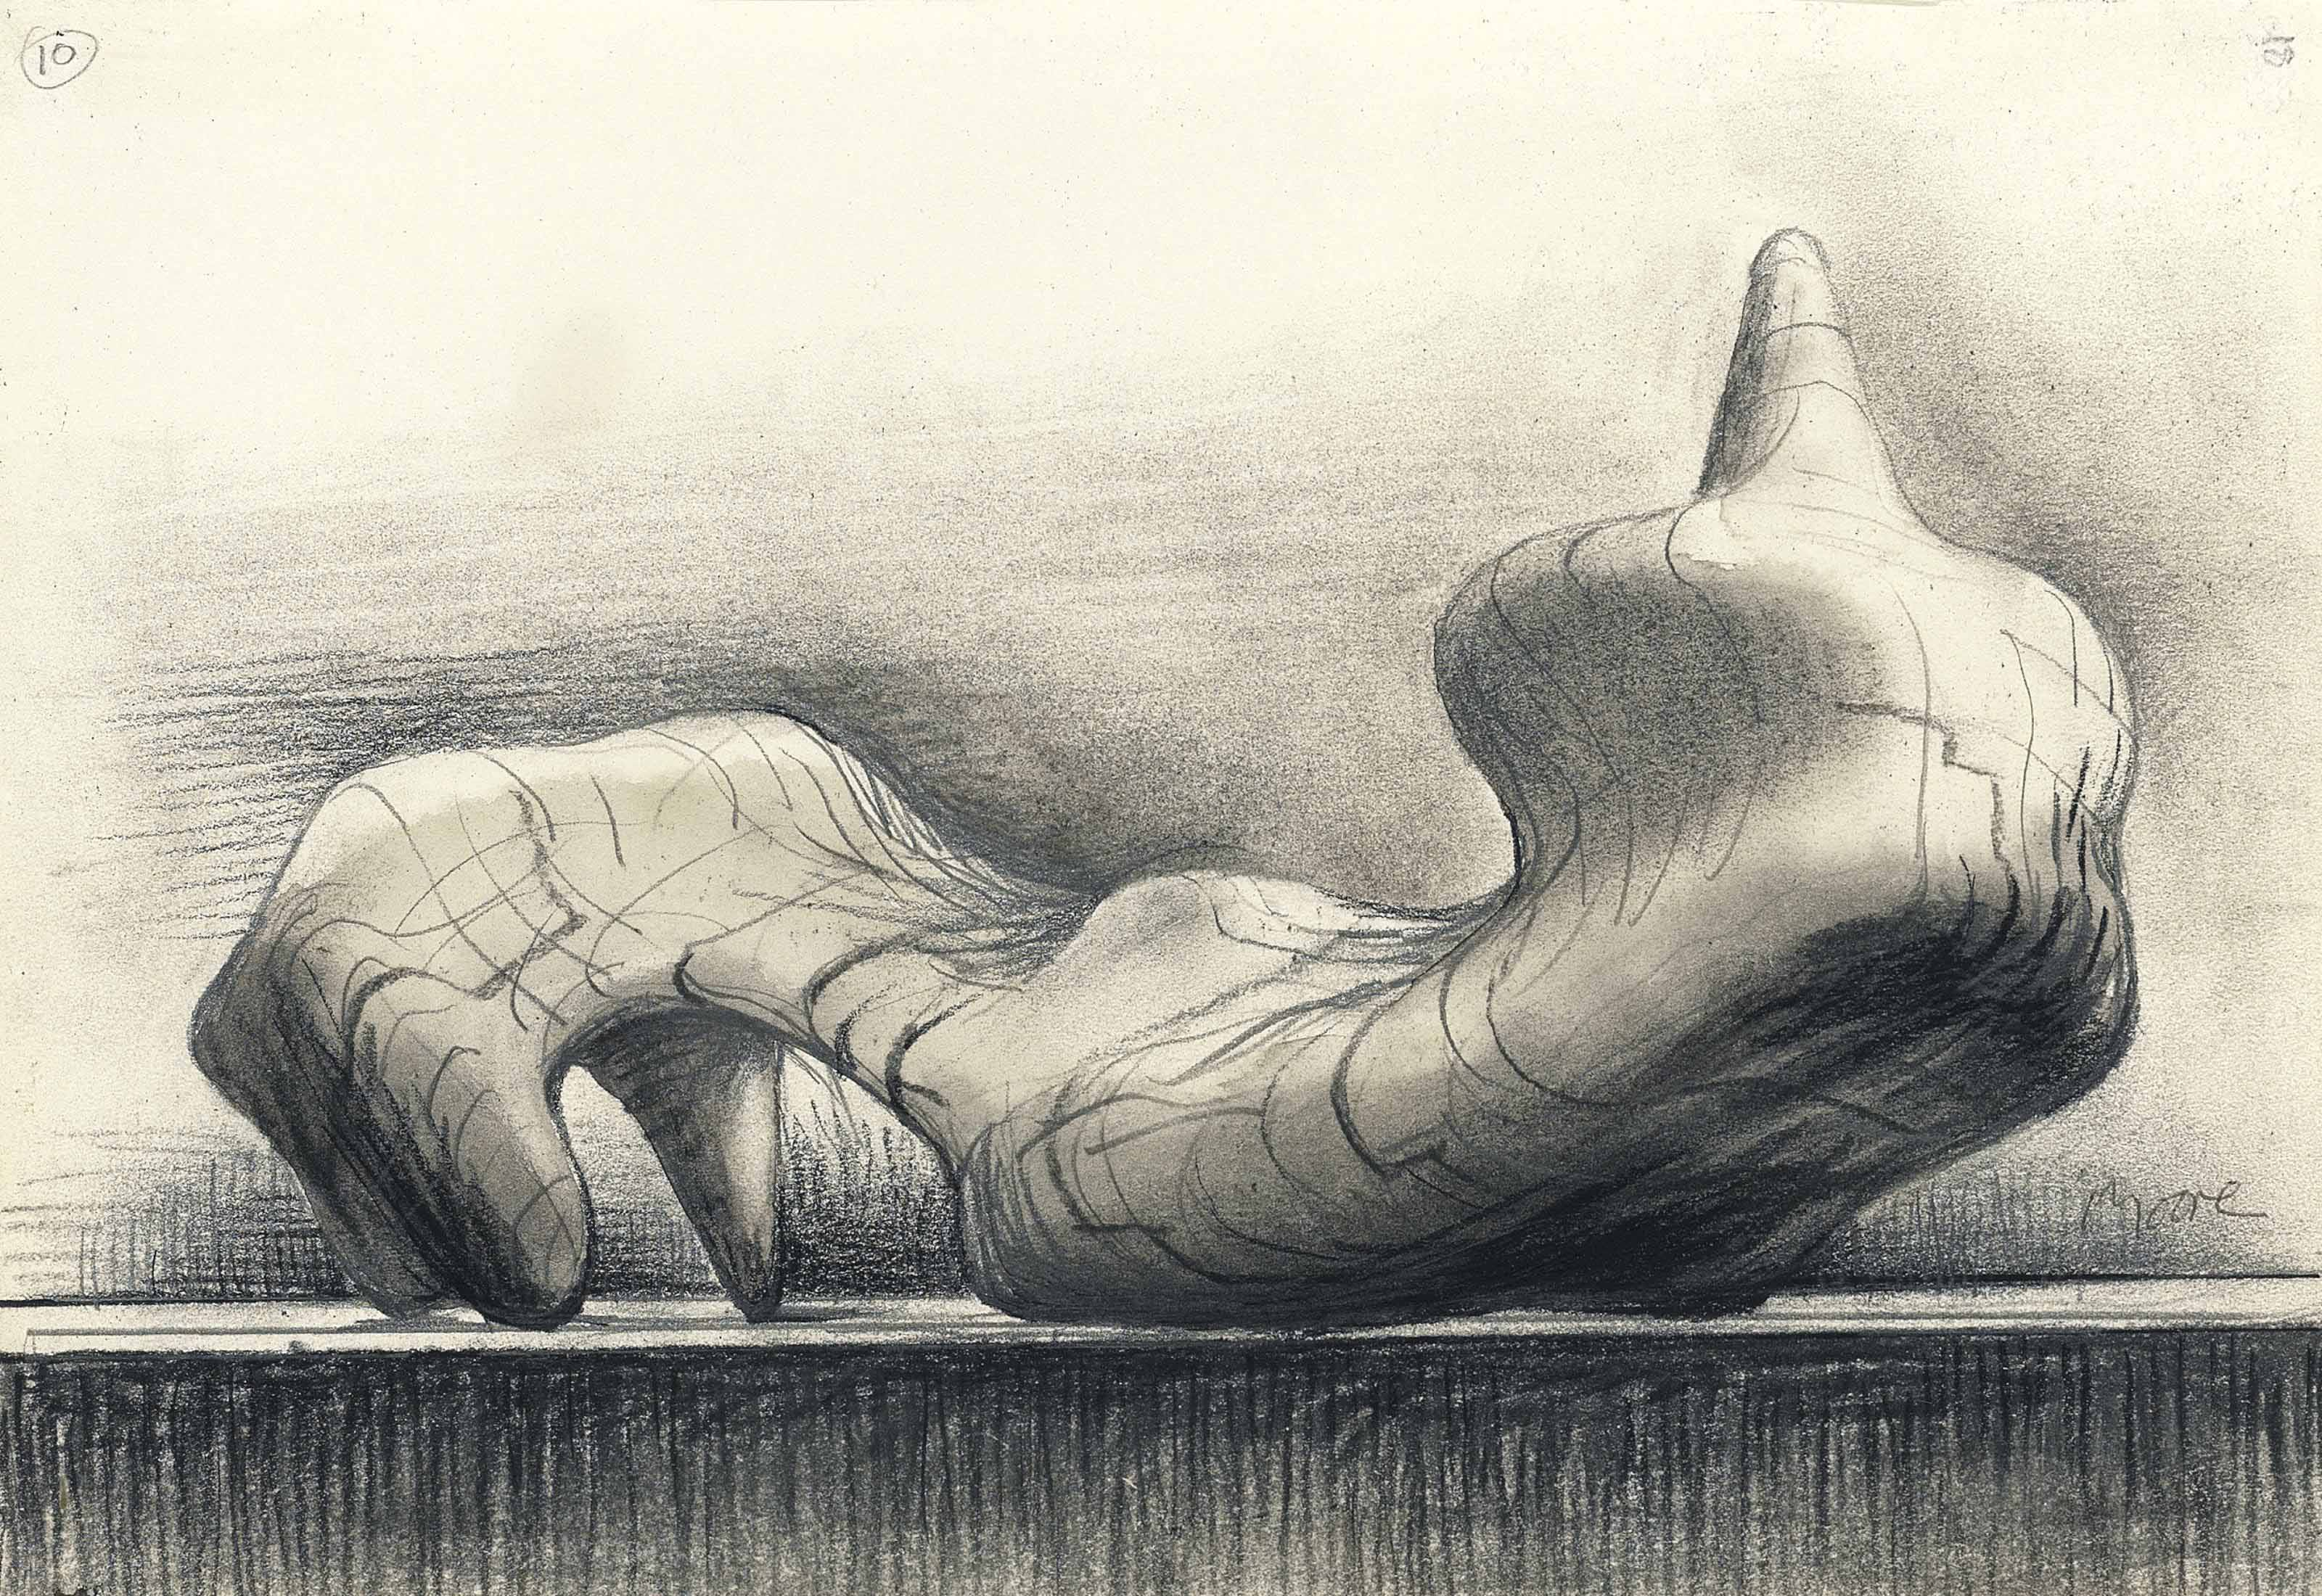 Henry Moore, O.M., C.H. (1898-1986)